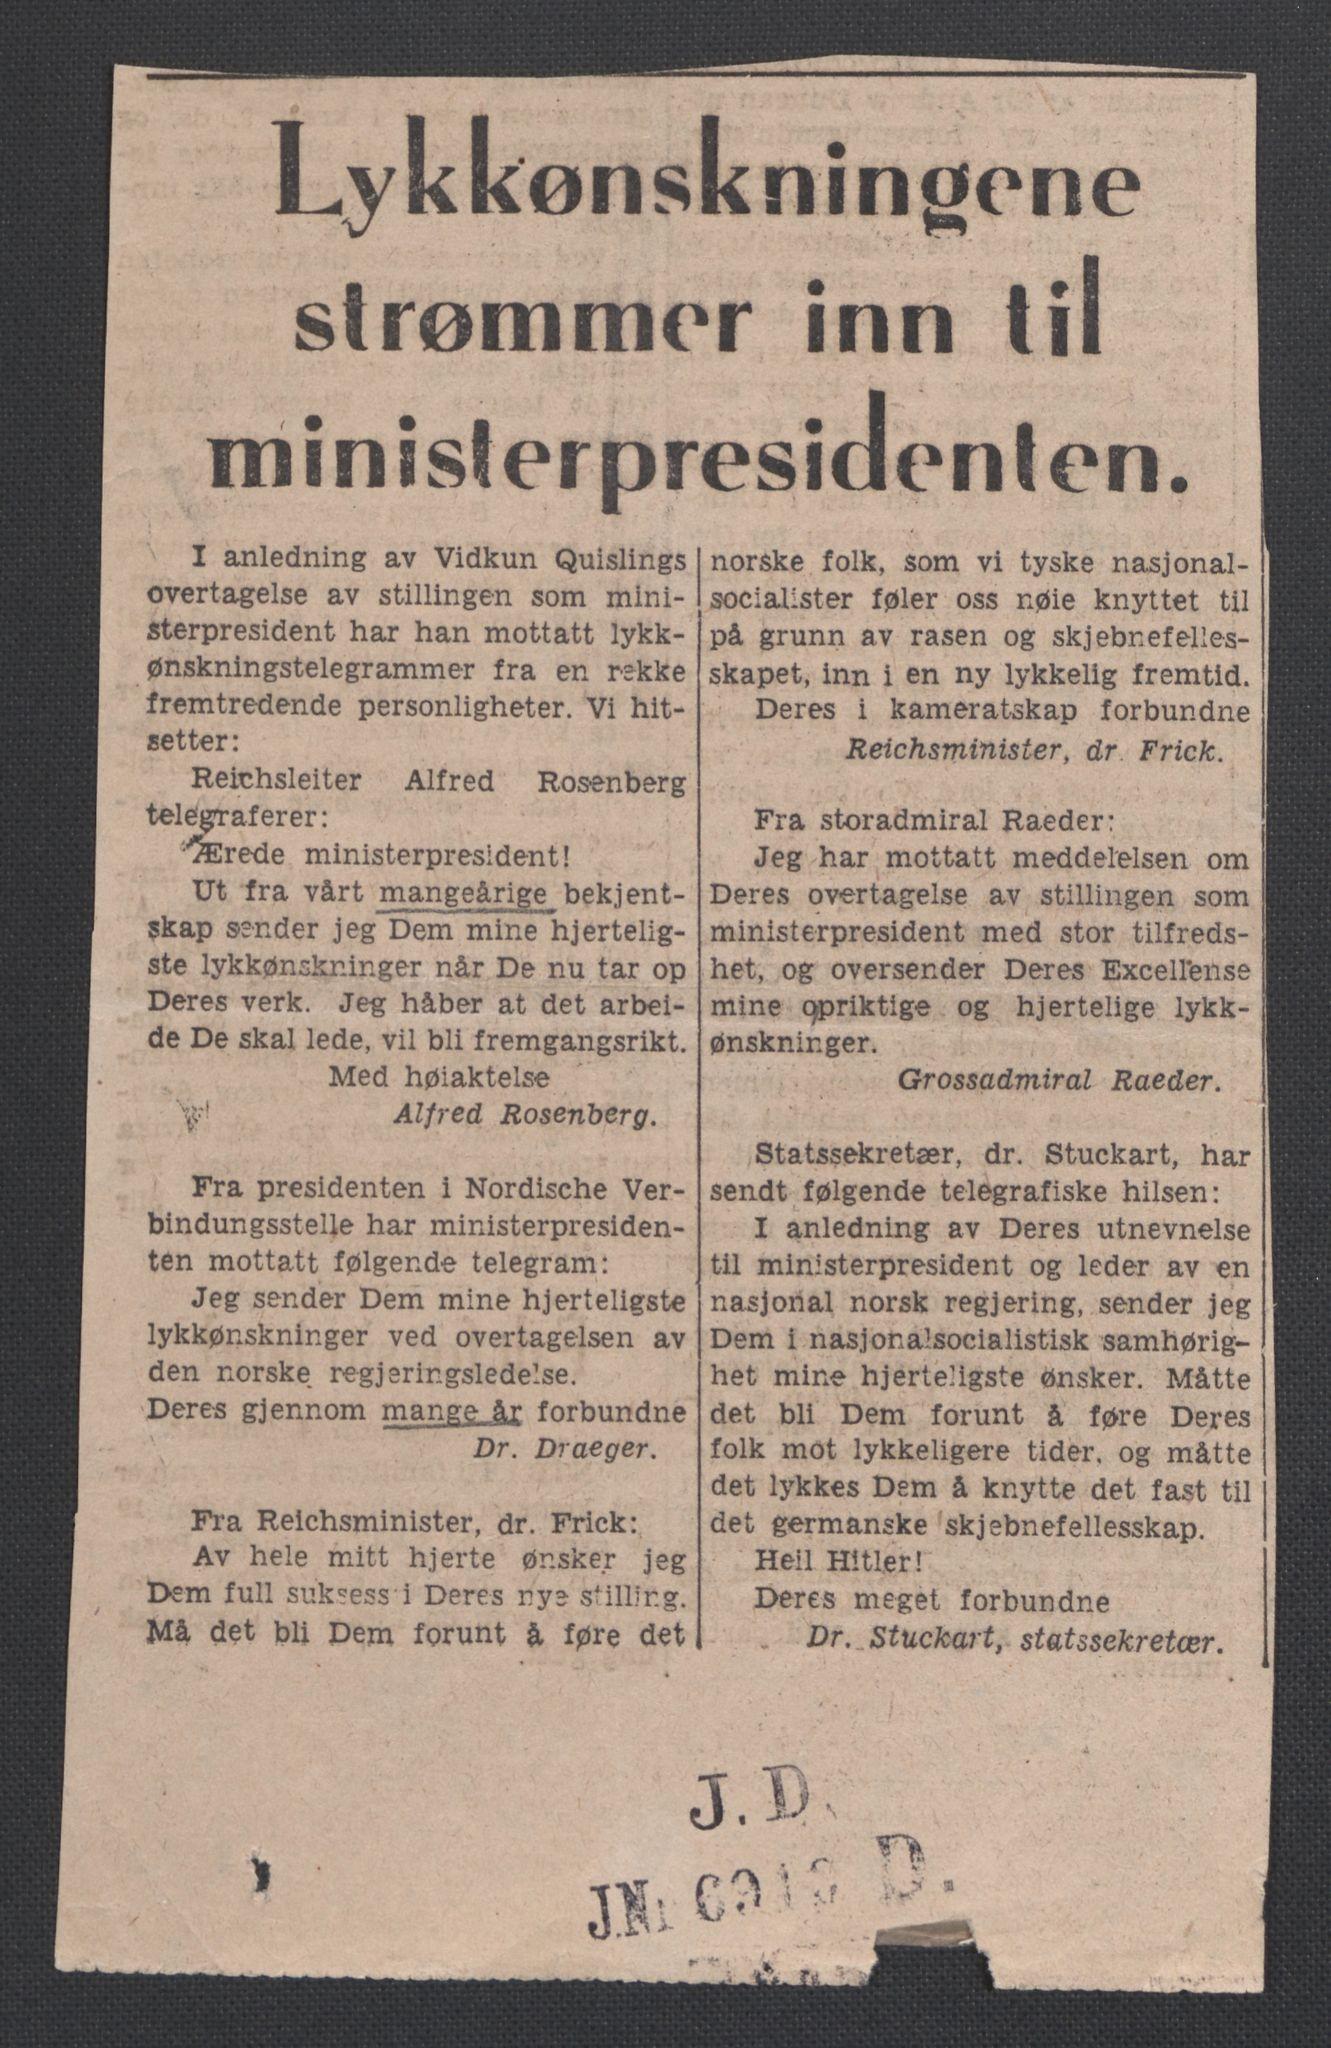 RA, Landssvikarkivet, D/Da/L0006: Dnr. 29, 1945, s. 470